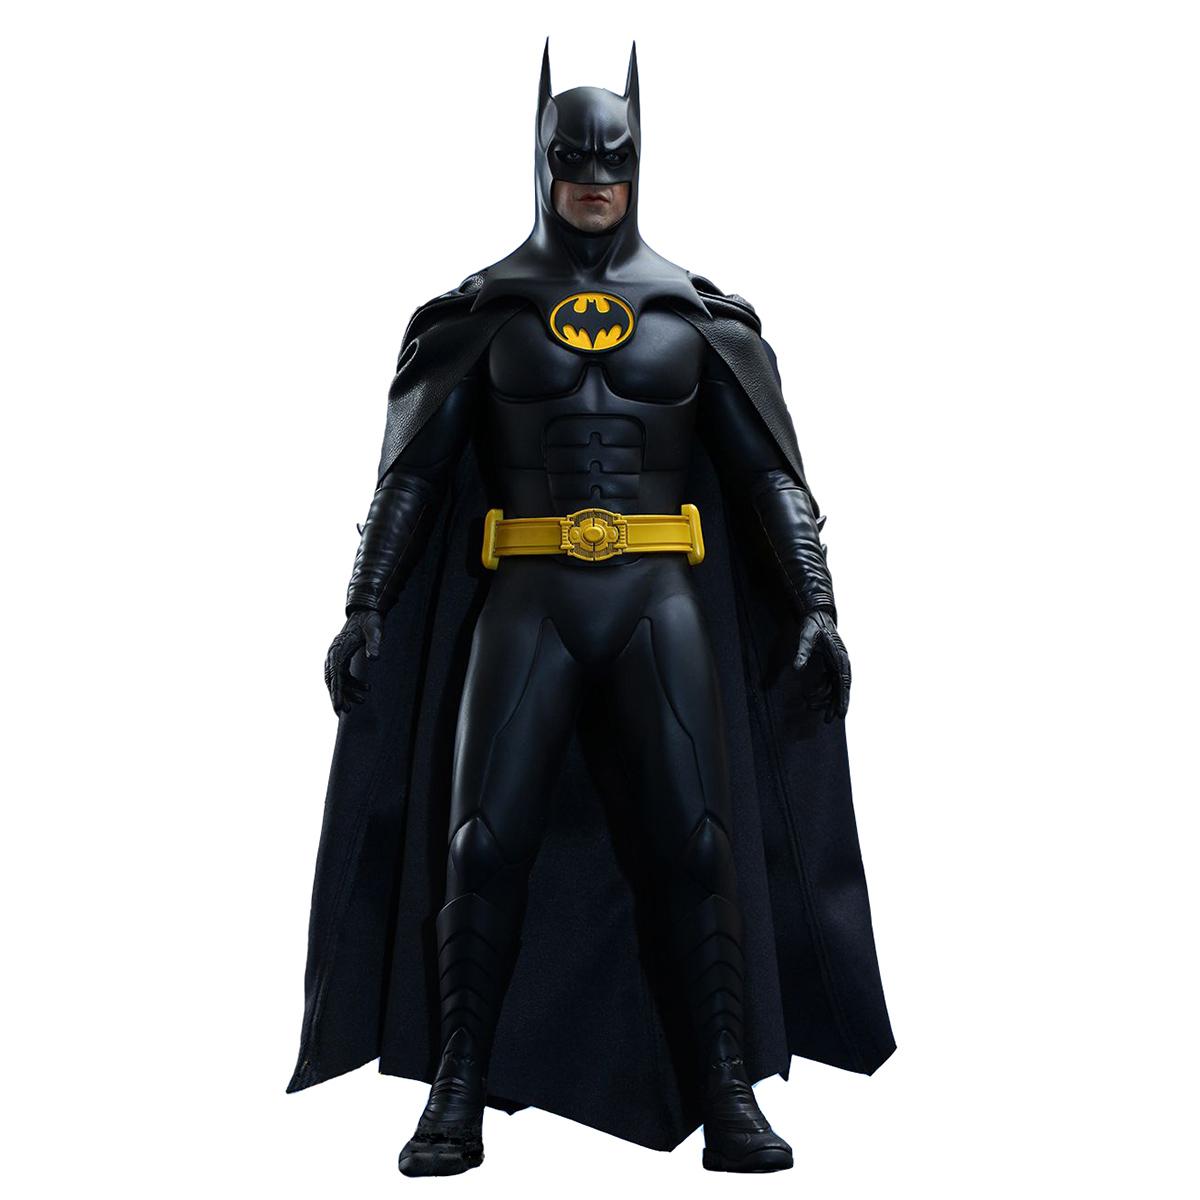 Hot Toys Batman Returns Batman Amp Bruce Wayne 1 6th Scale